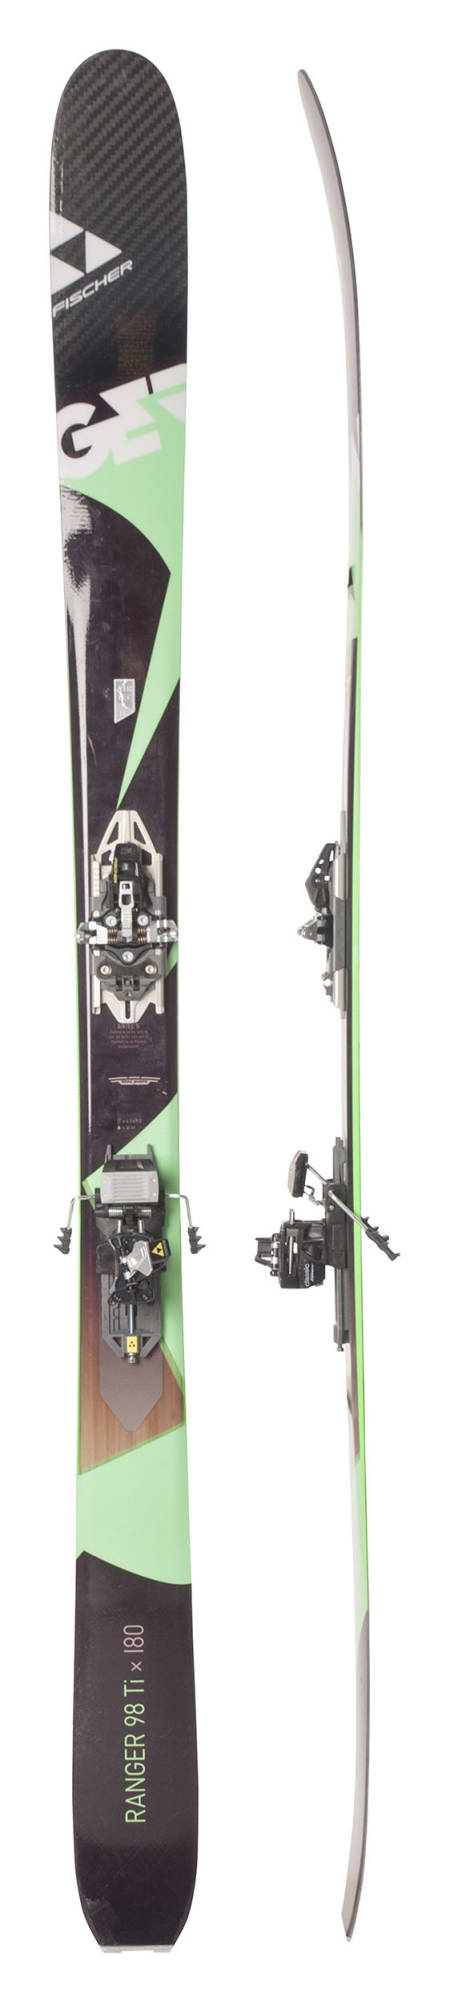 Fischer Ranger 98 TI